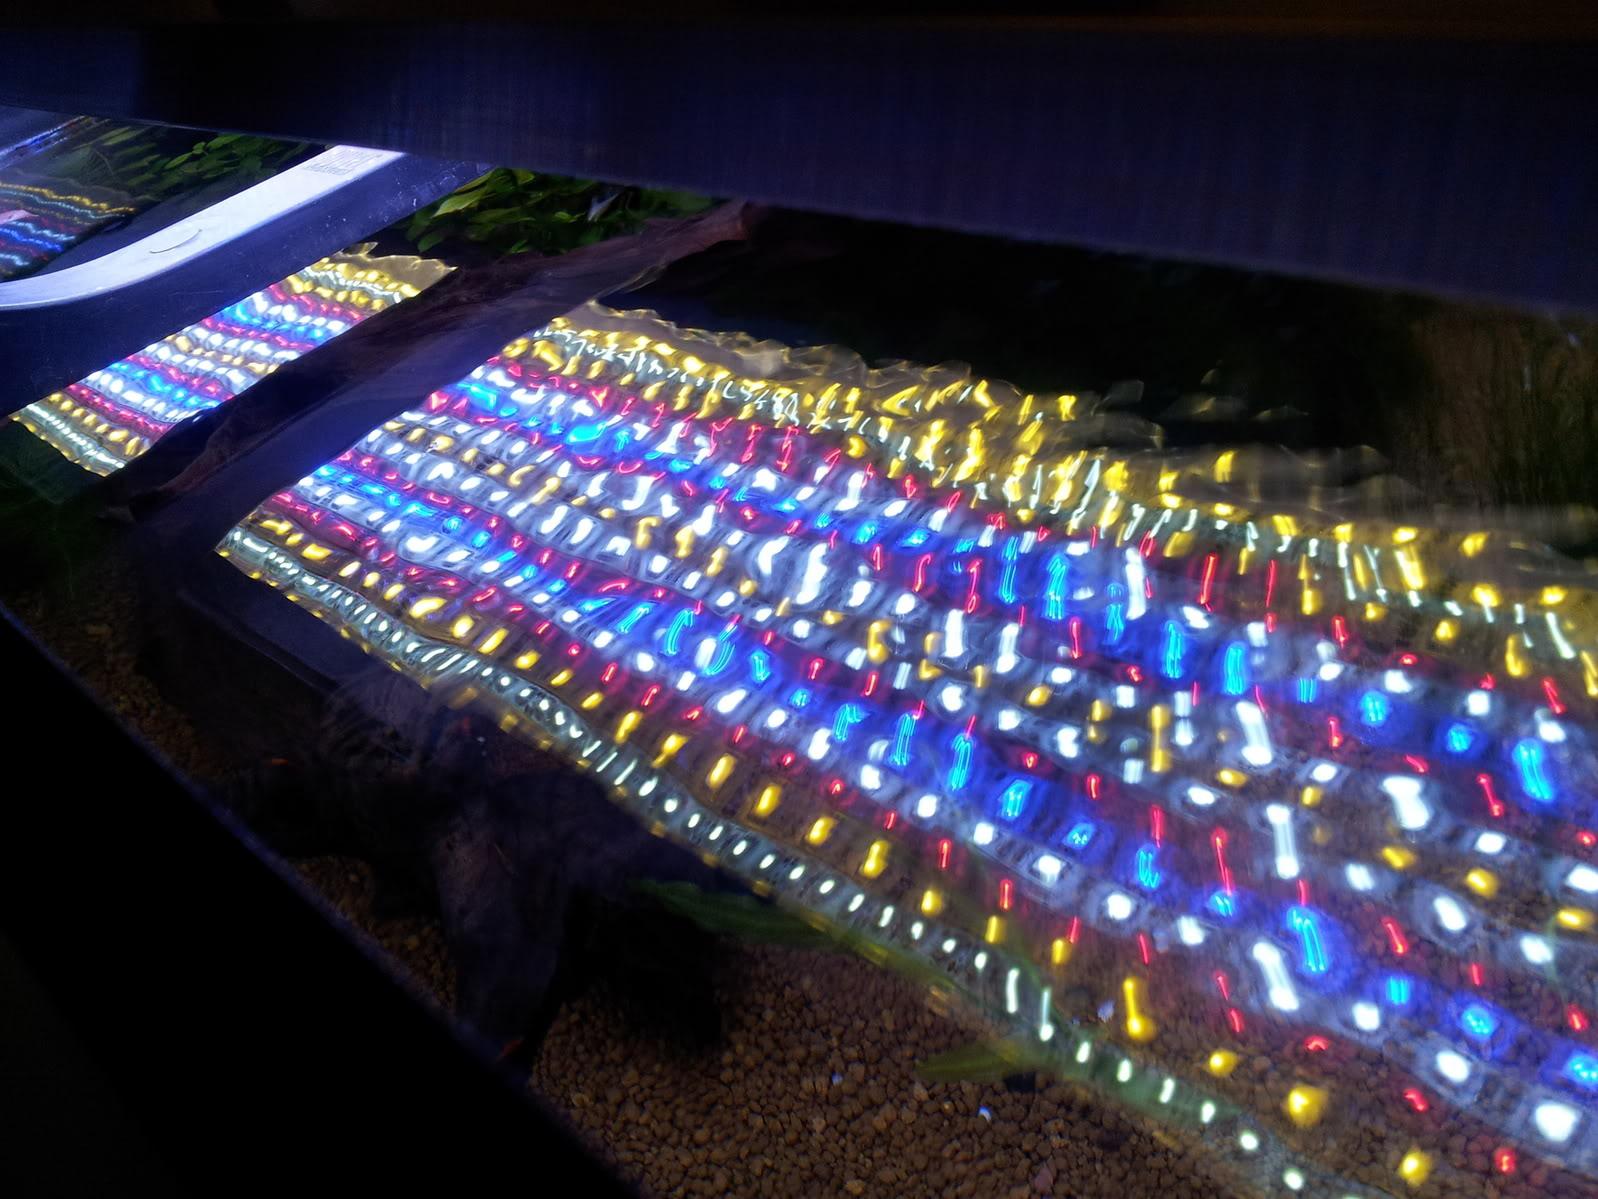 Fabrication galerie LED pour Juwel rio 125 (80cmx20cmx1.8cm) 20120715_205805